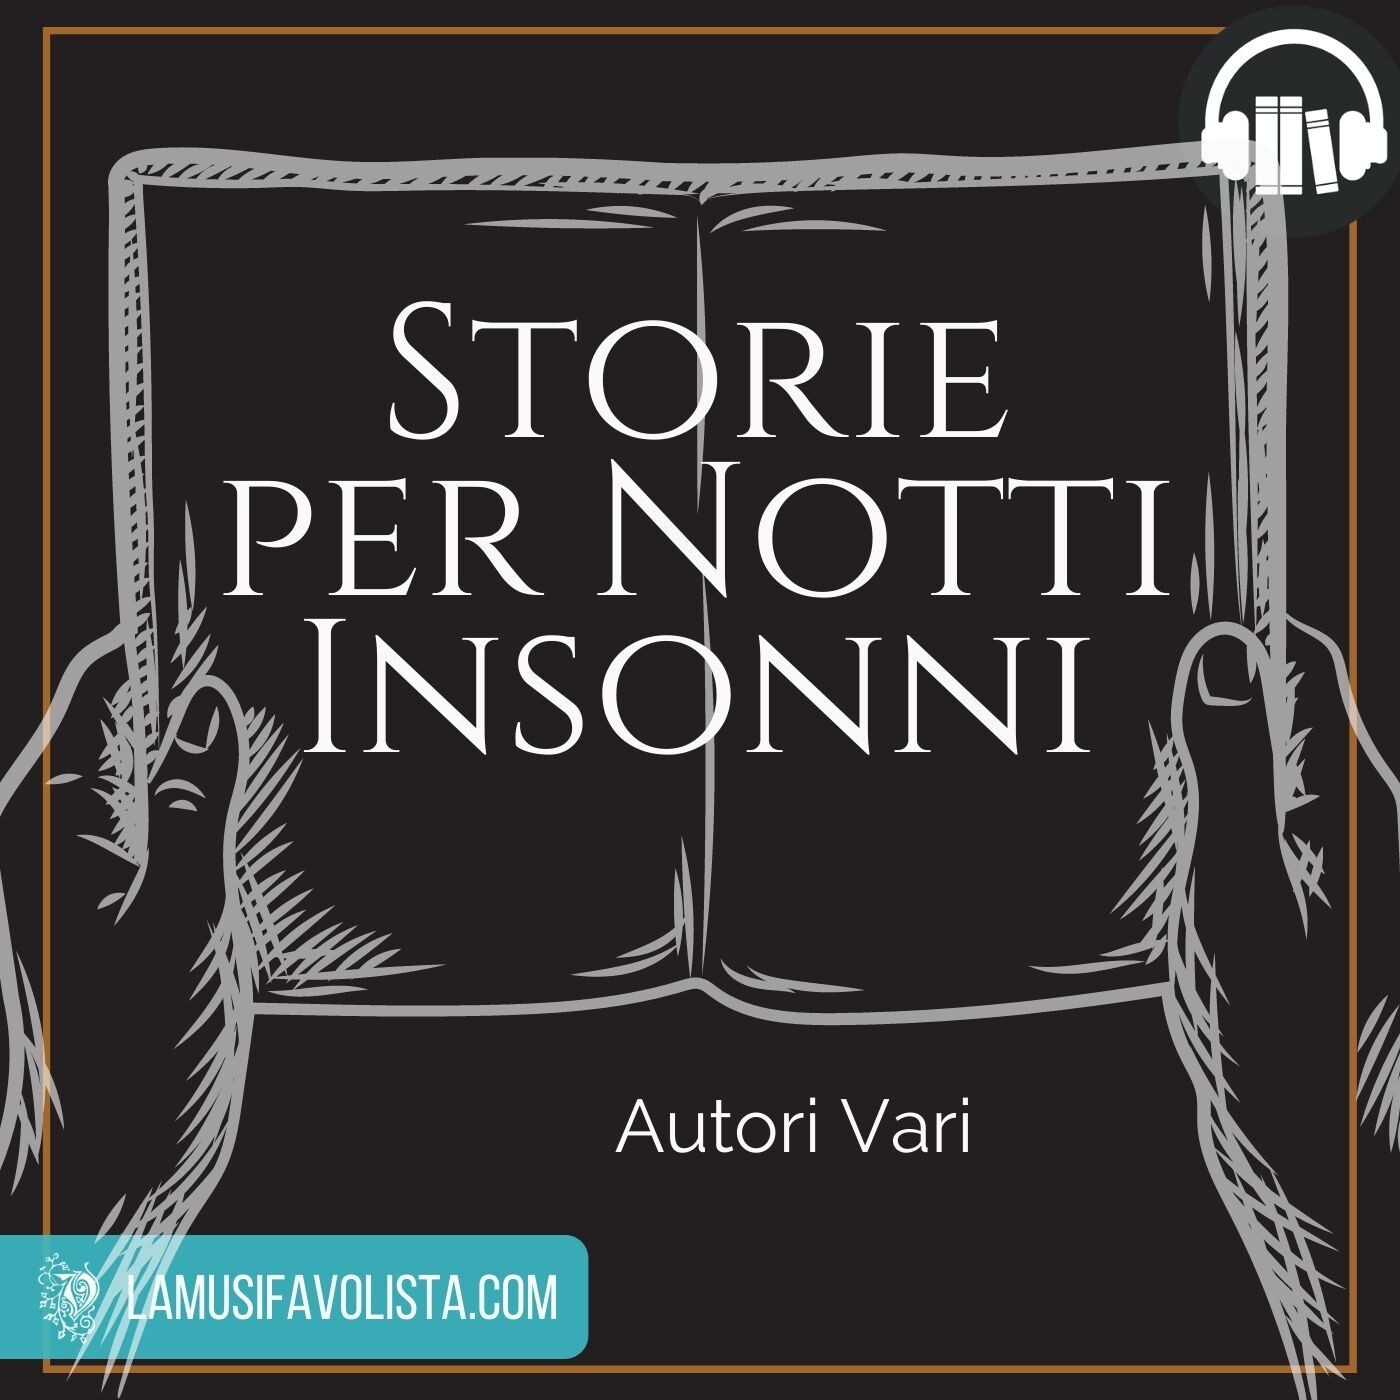 EX OBLIVIONE • H.P. Lovecraft ☎ Audioracconto ☎ Storie per Notti Insonni ☎